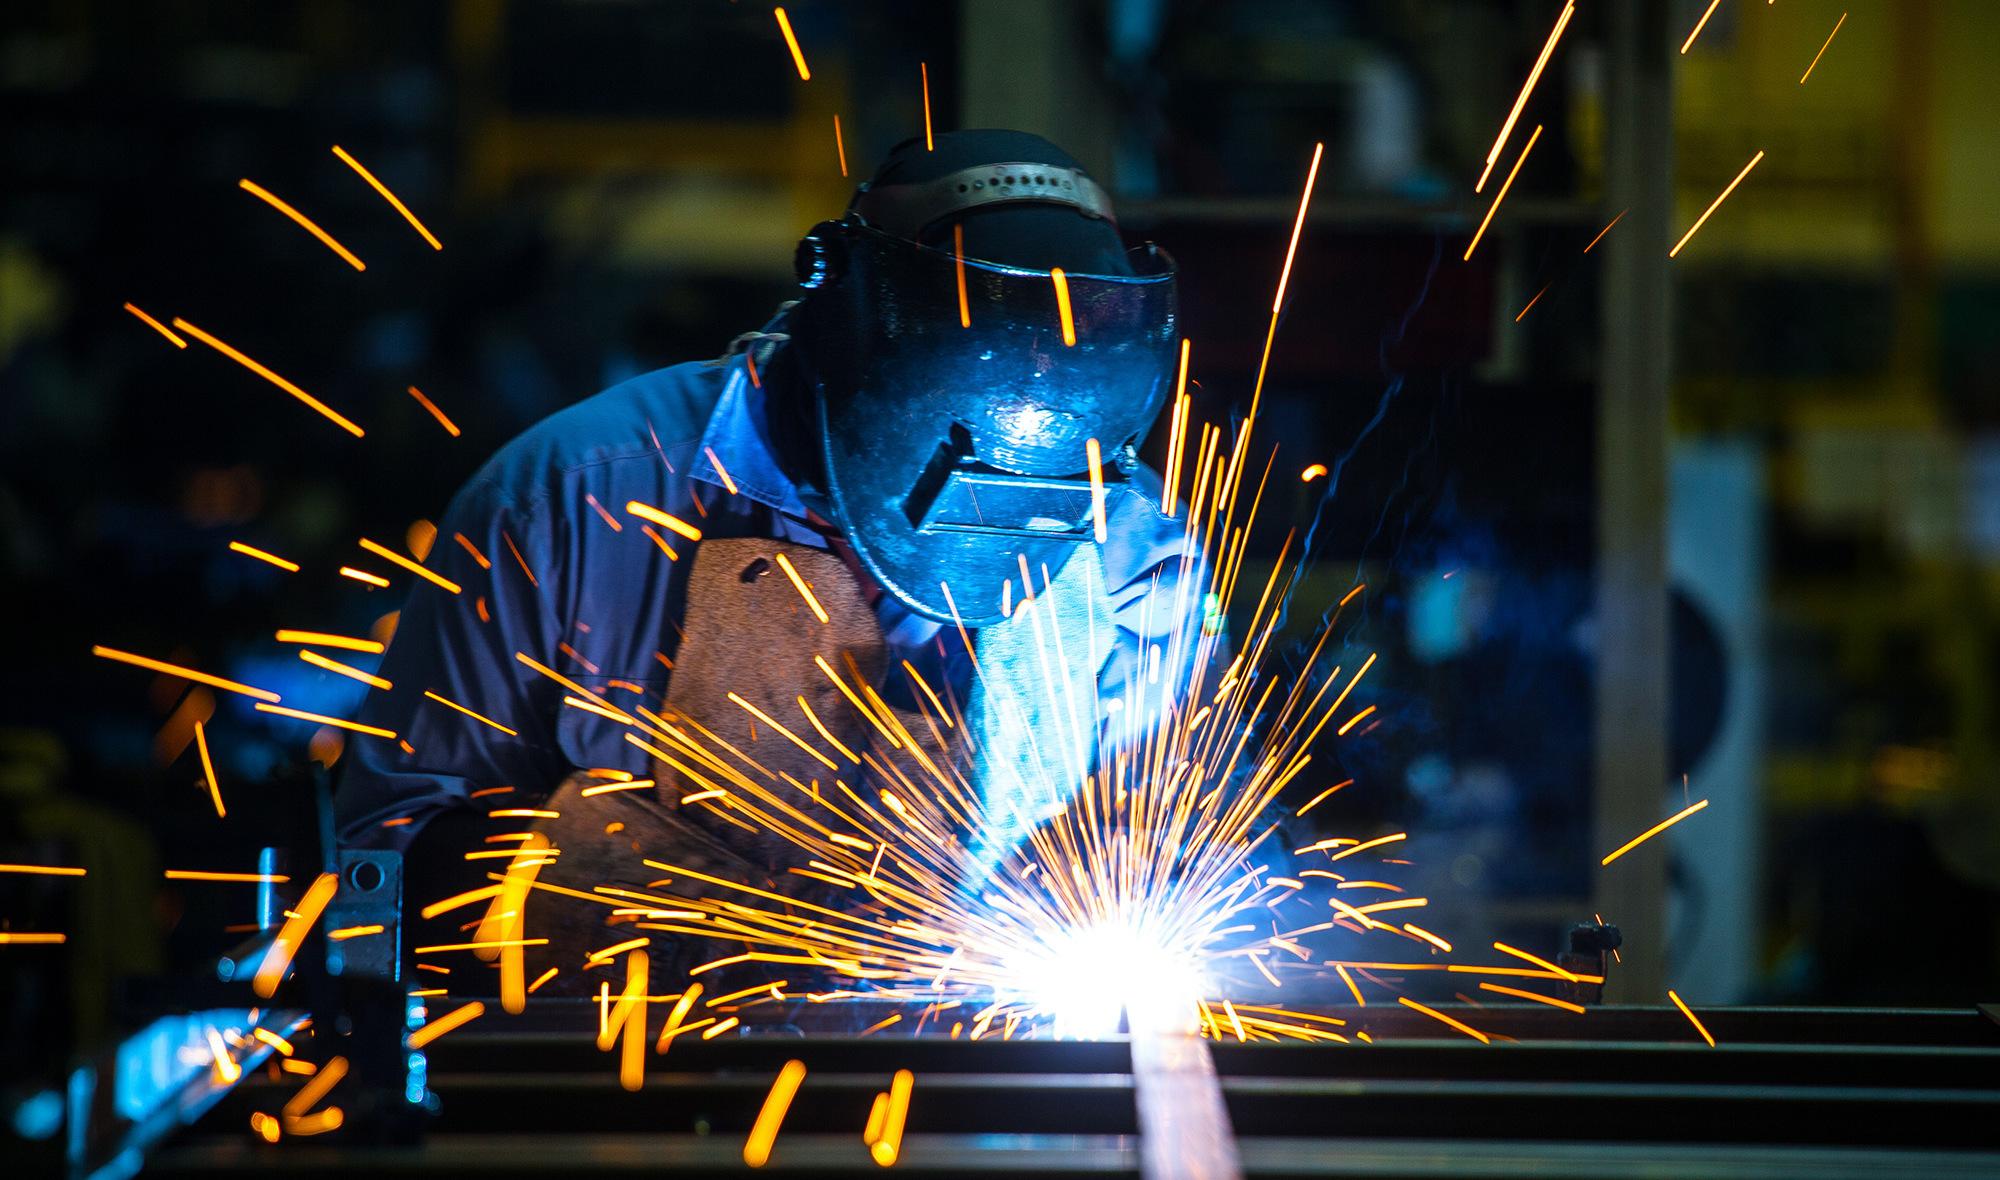 Machine welding for your convenience in La Crosse, WI